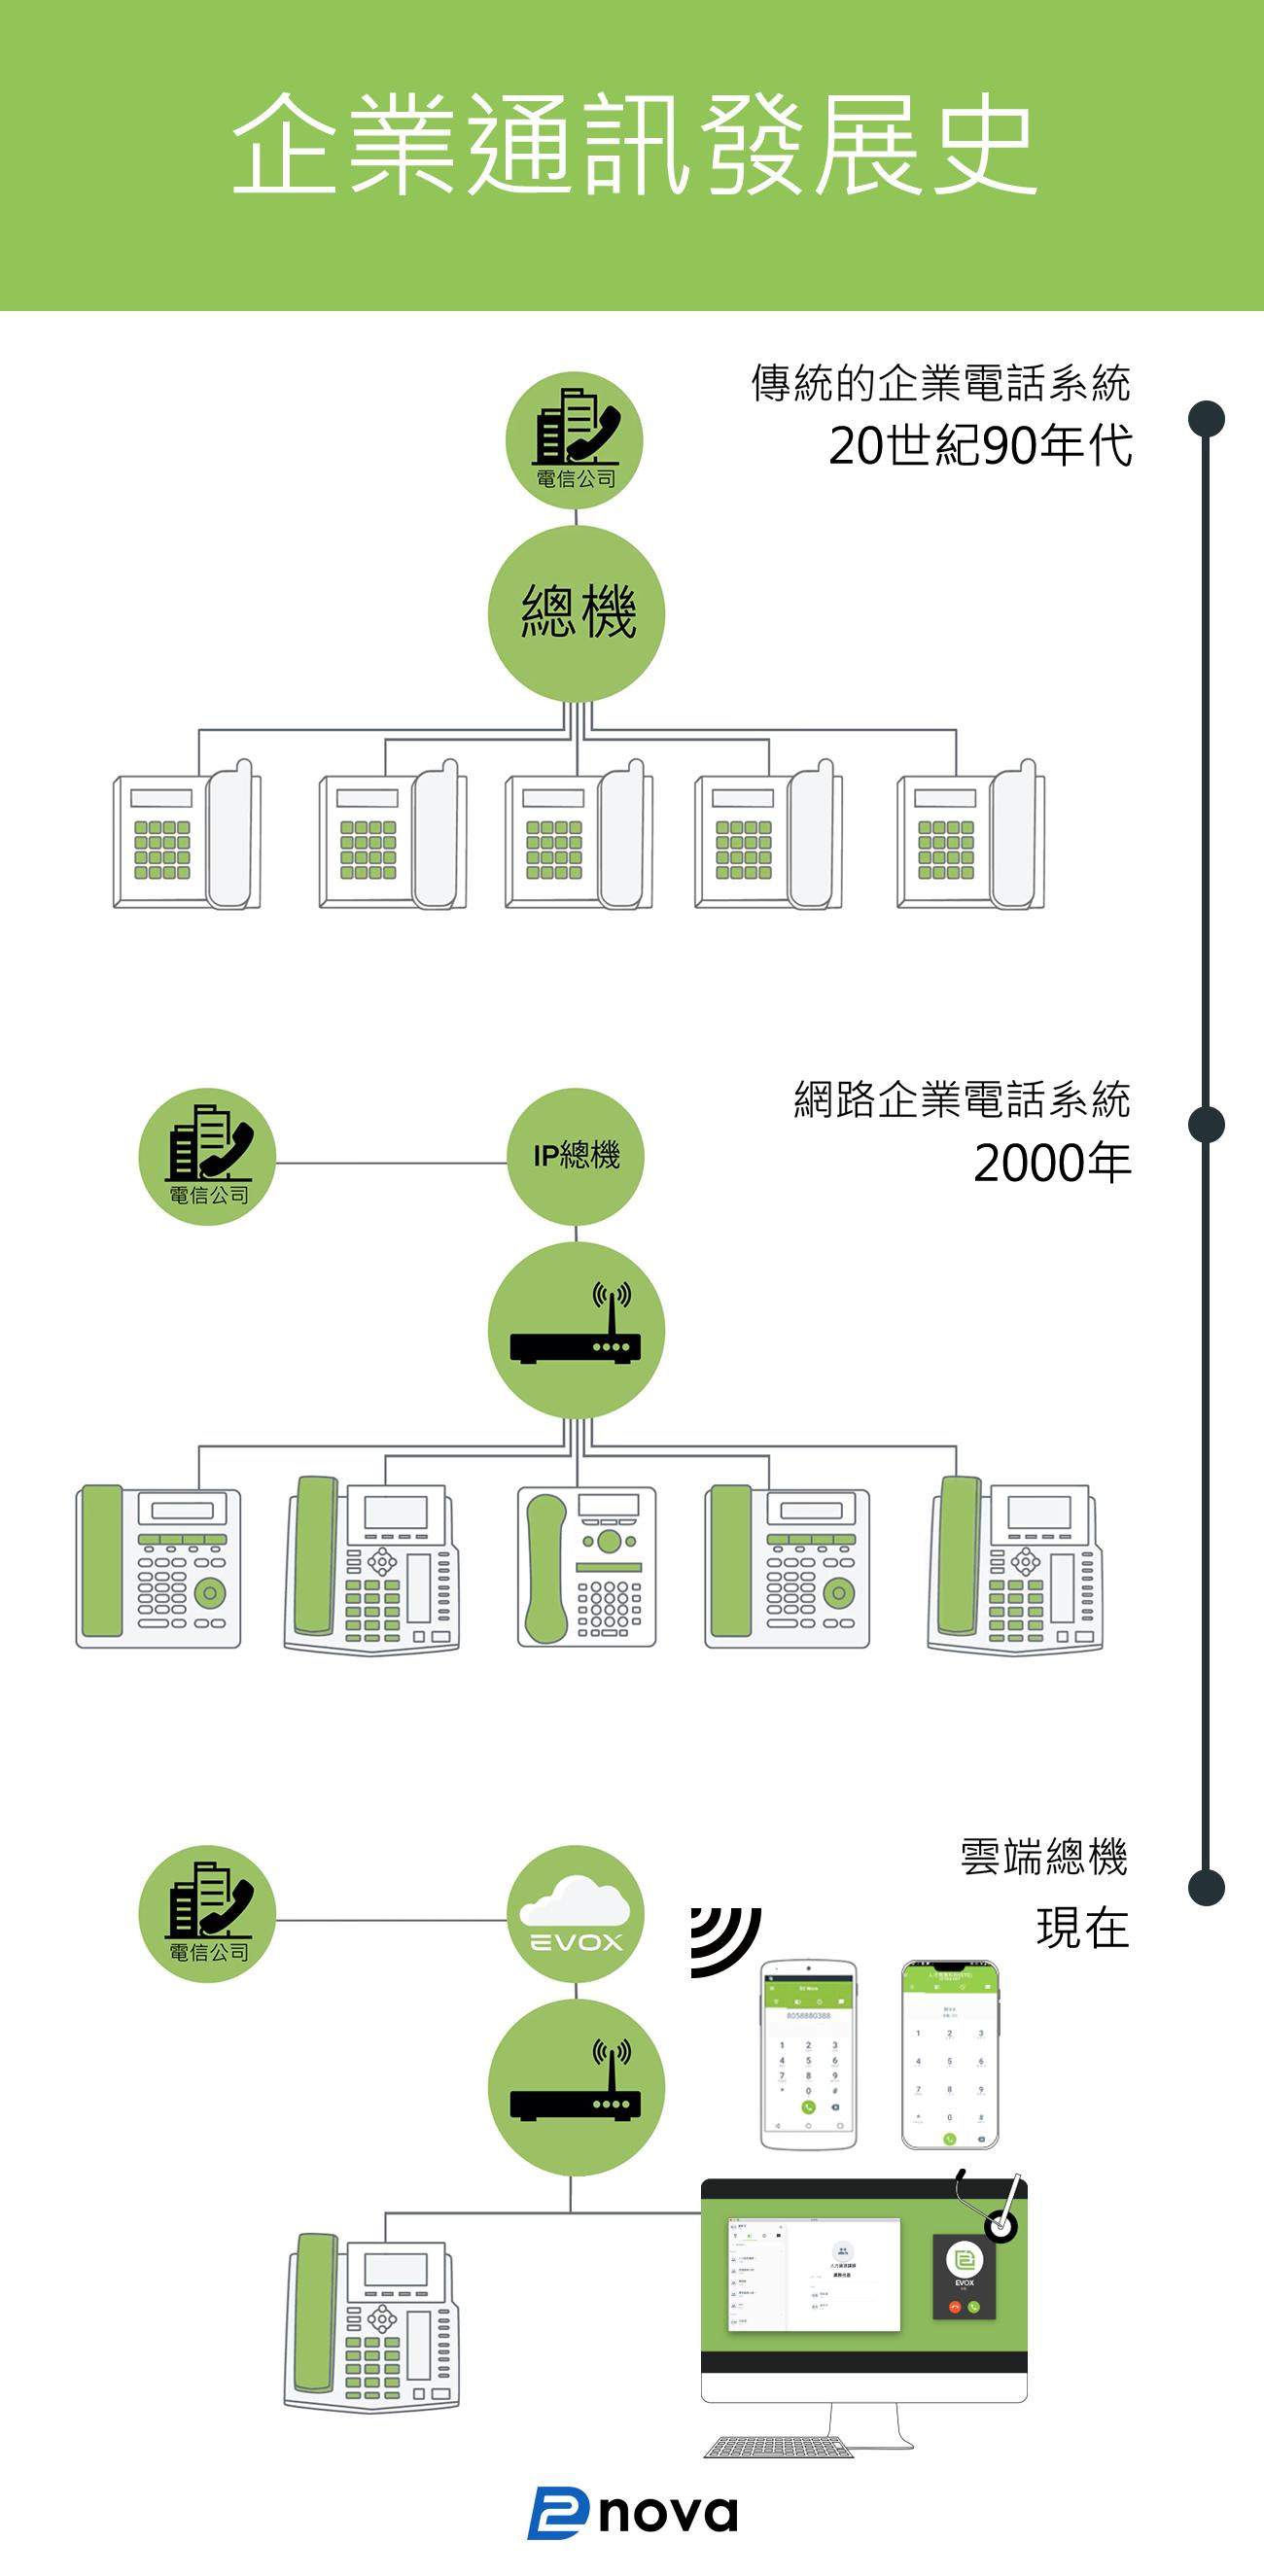 cloudpbx infographic 雲端總機  企業通訊